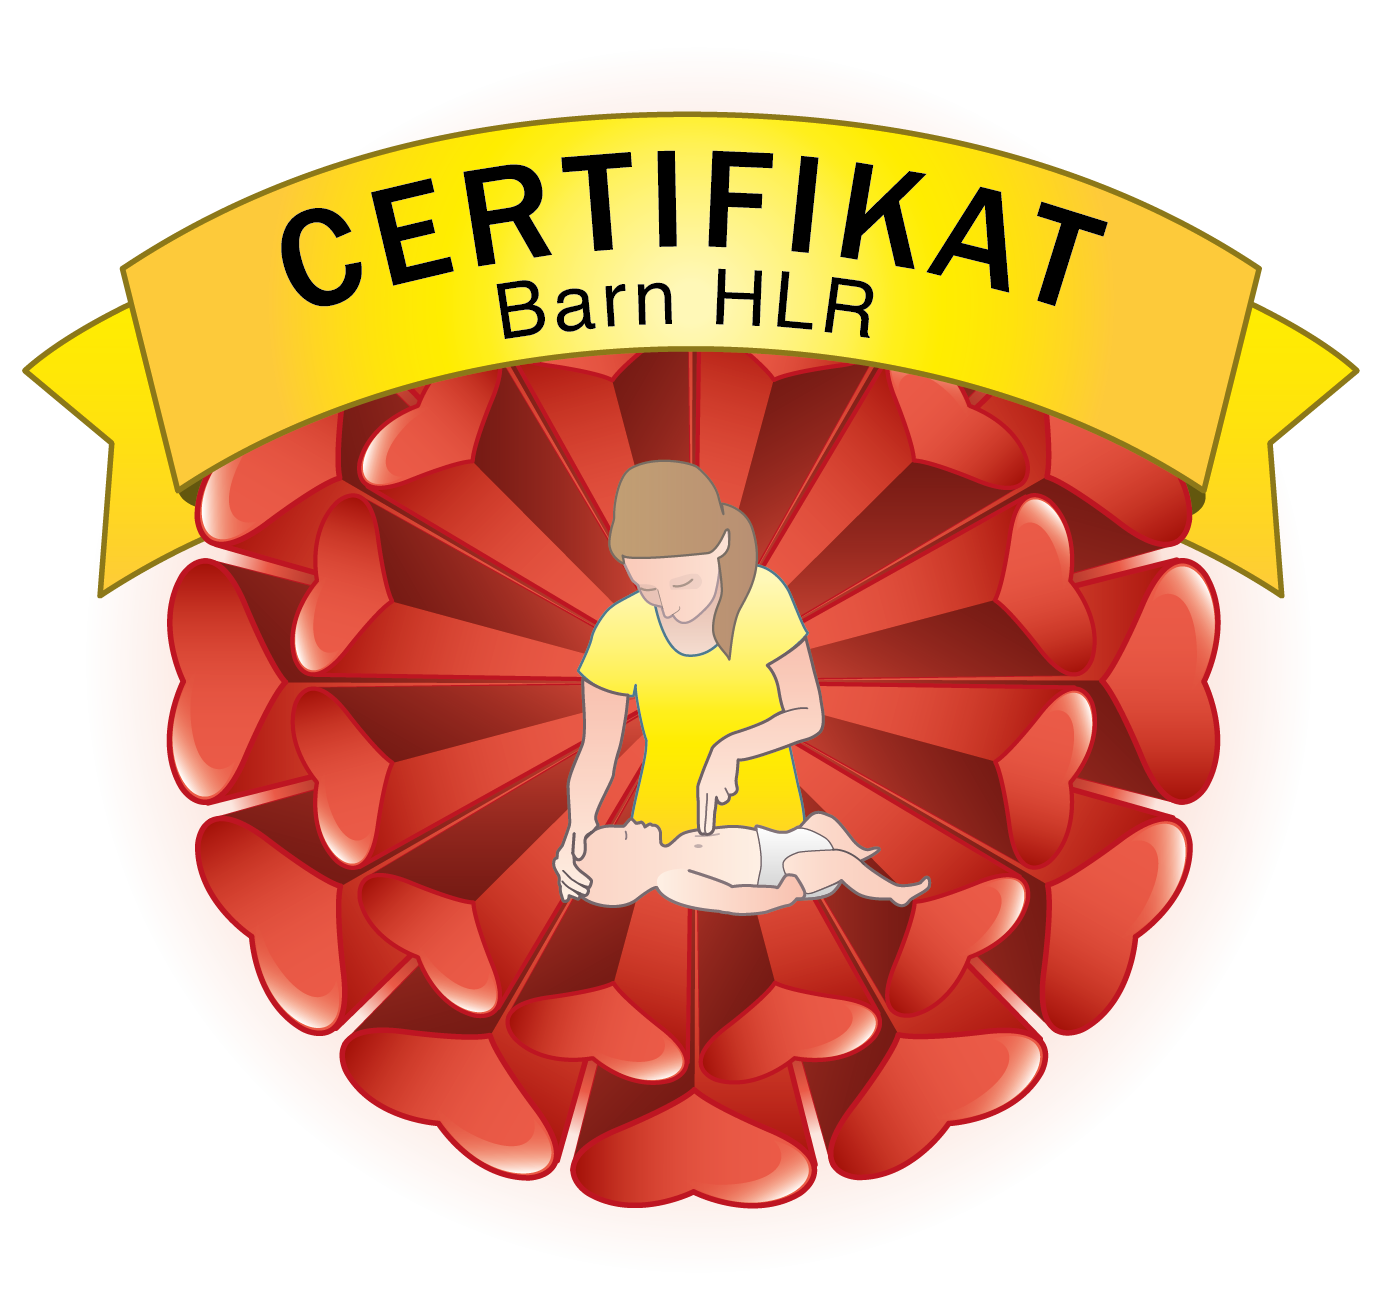 Certifikat - Barn HLR